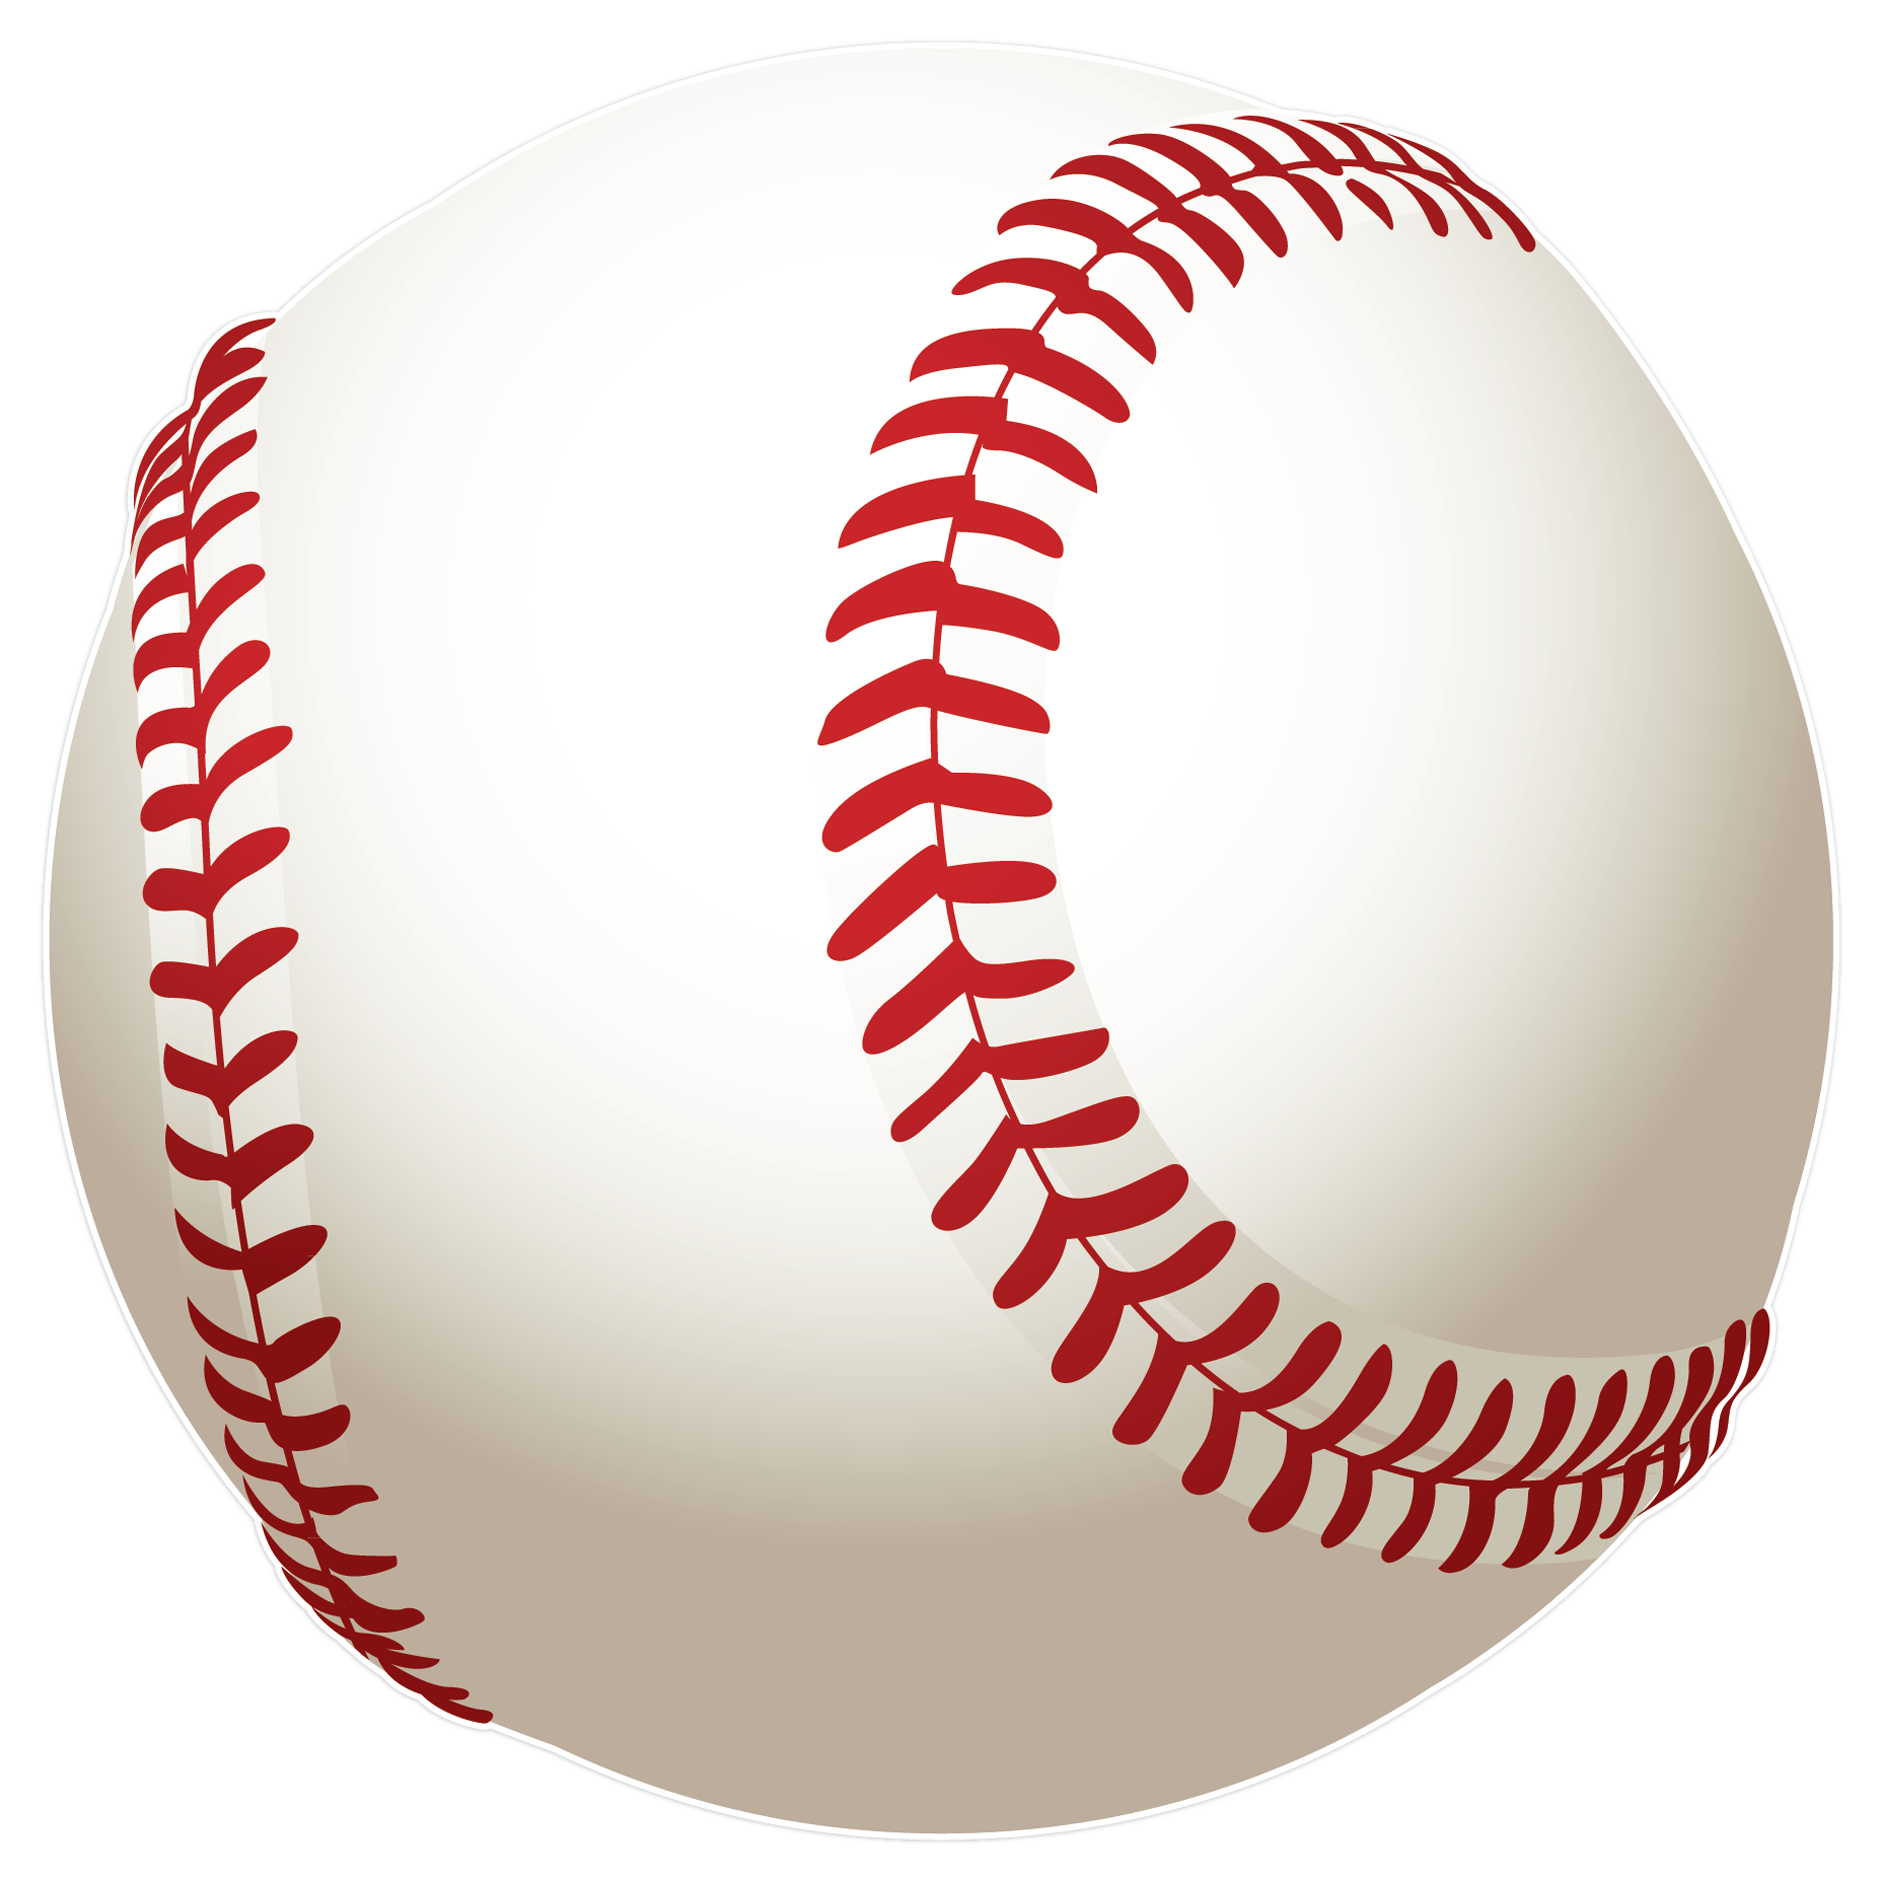 Bomb clipart baseball. Hd png transparent images